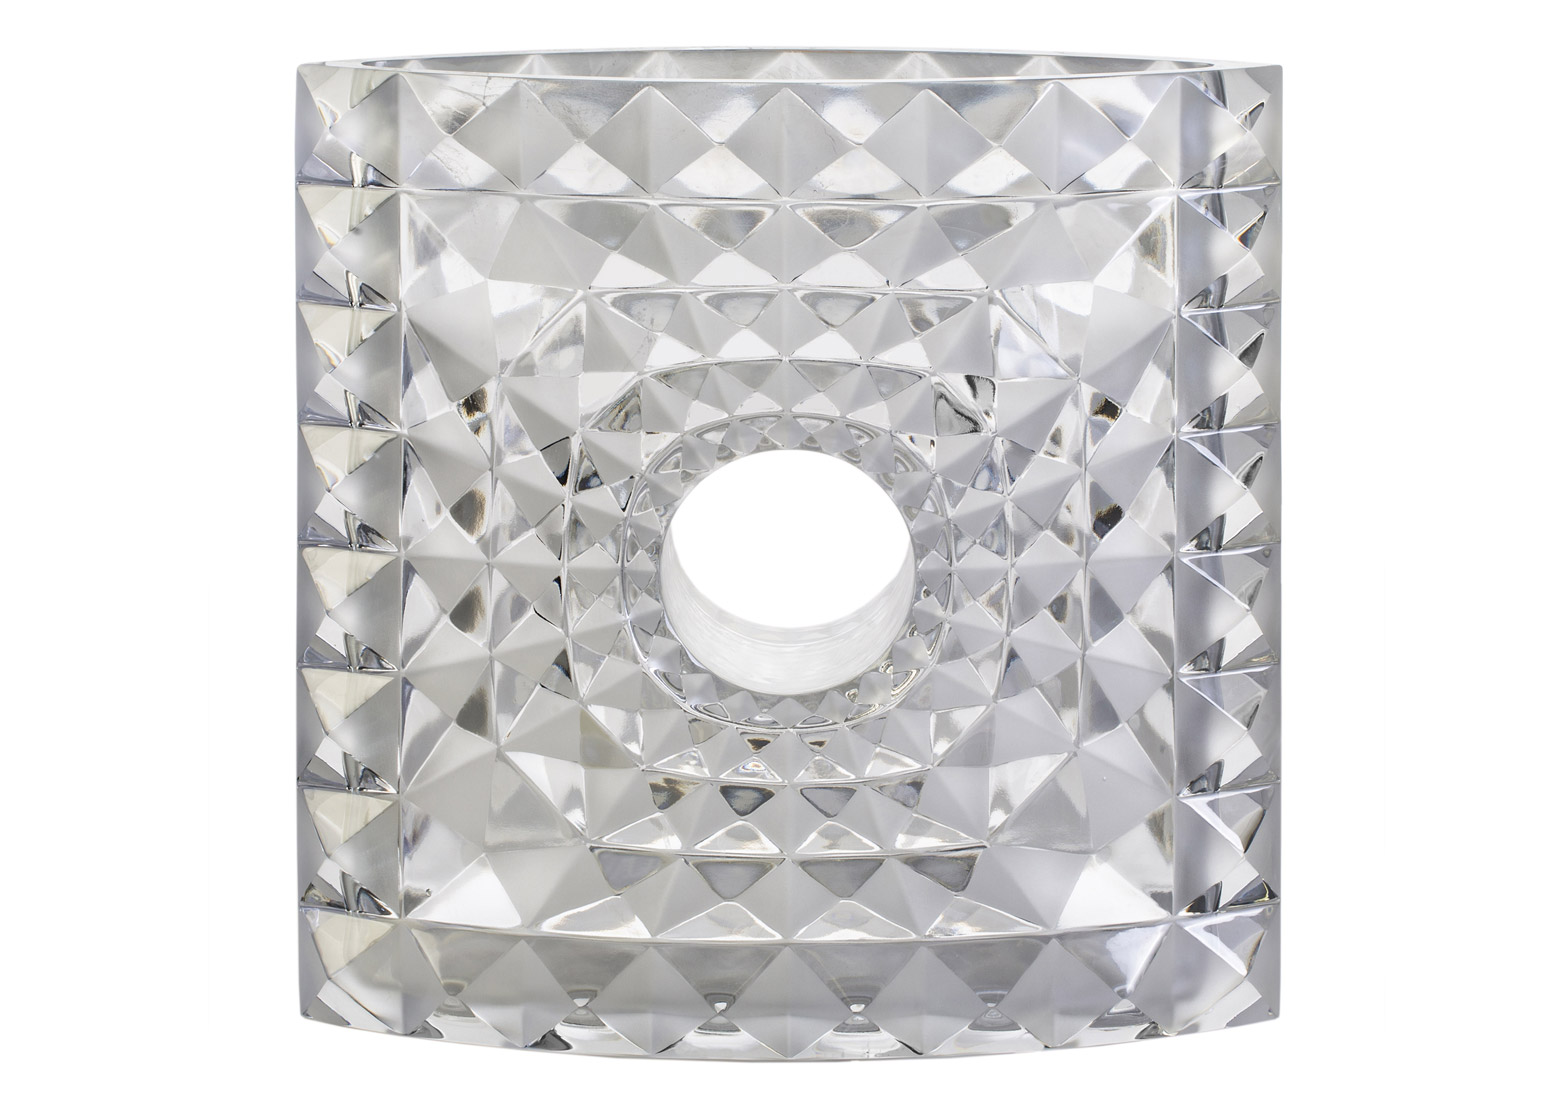 GEO Crystal architecture Mario Botta